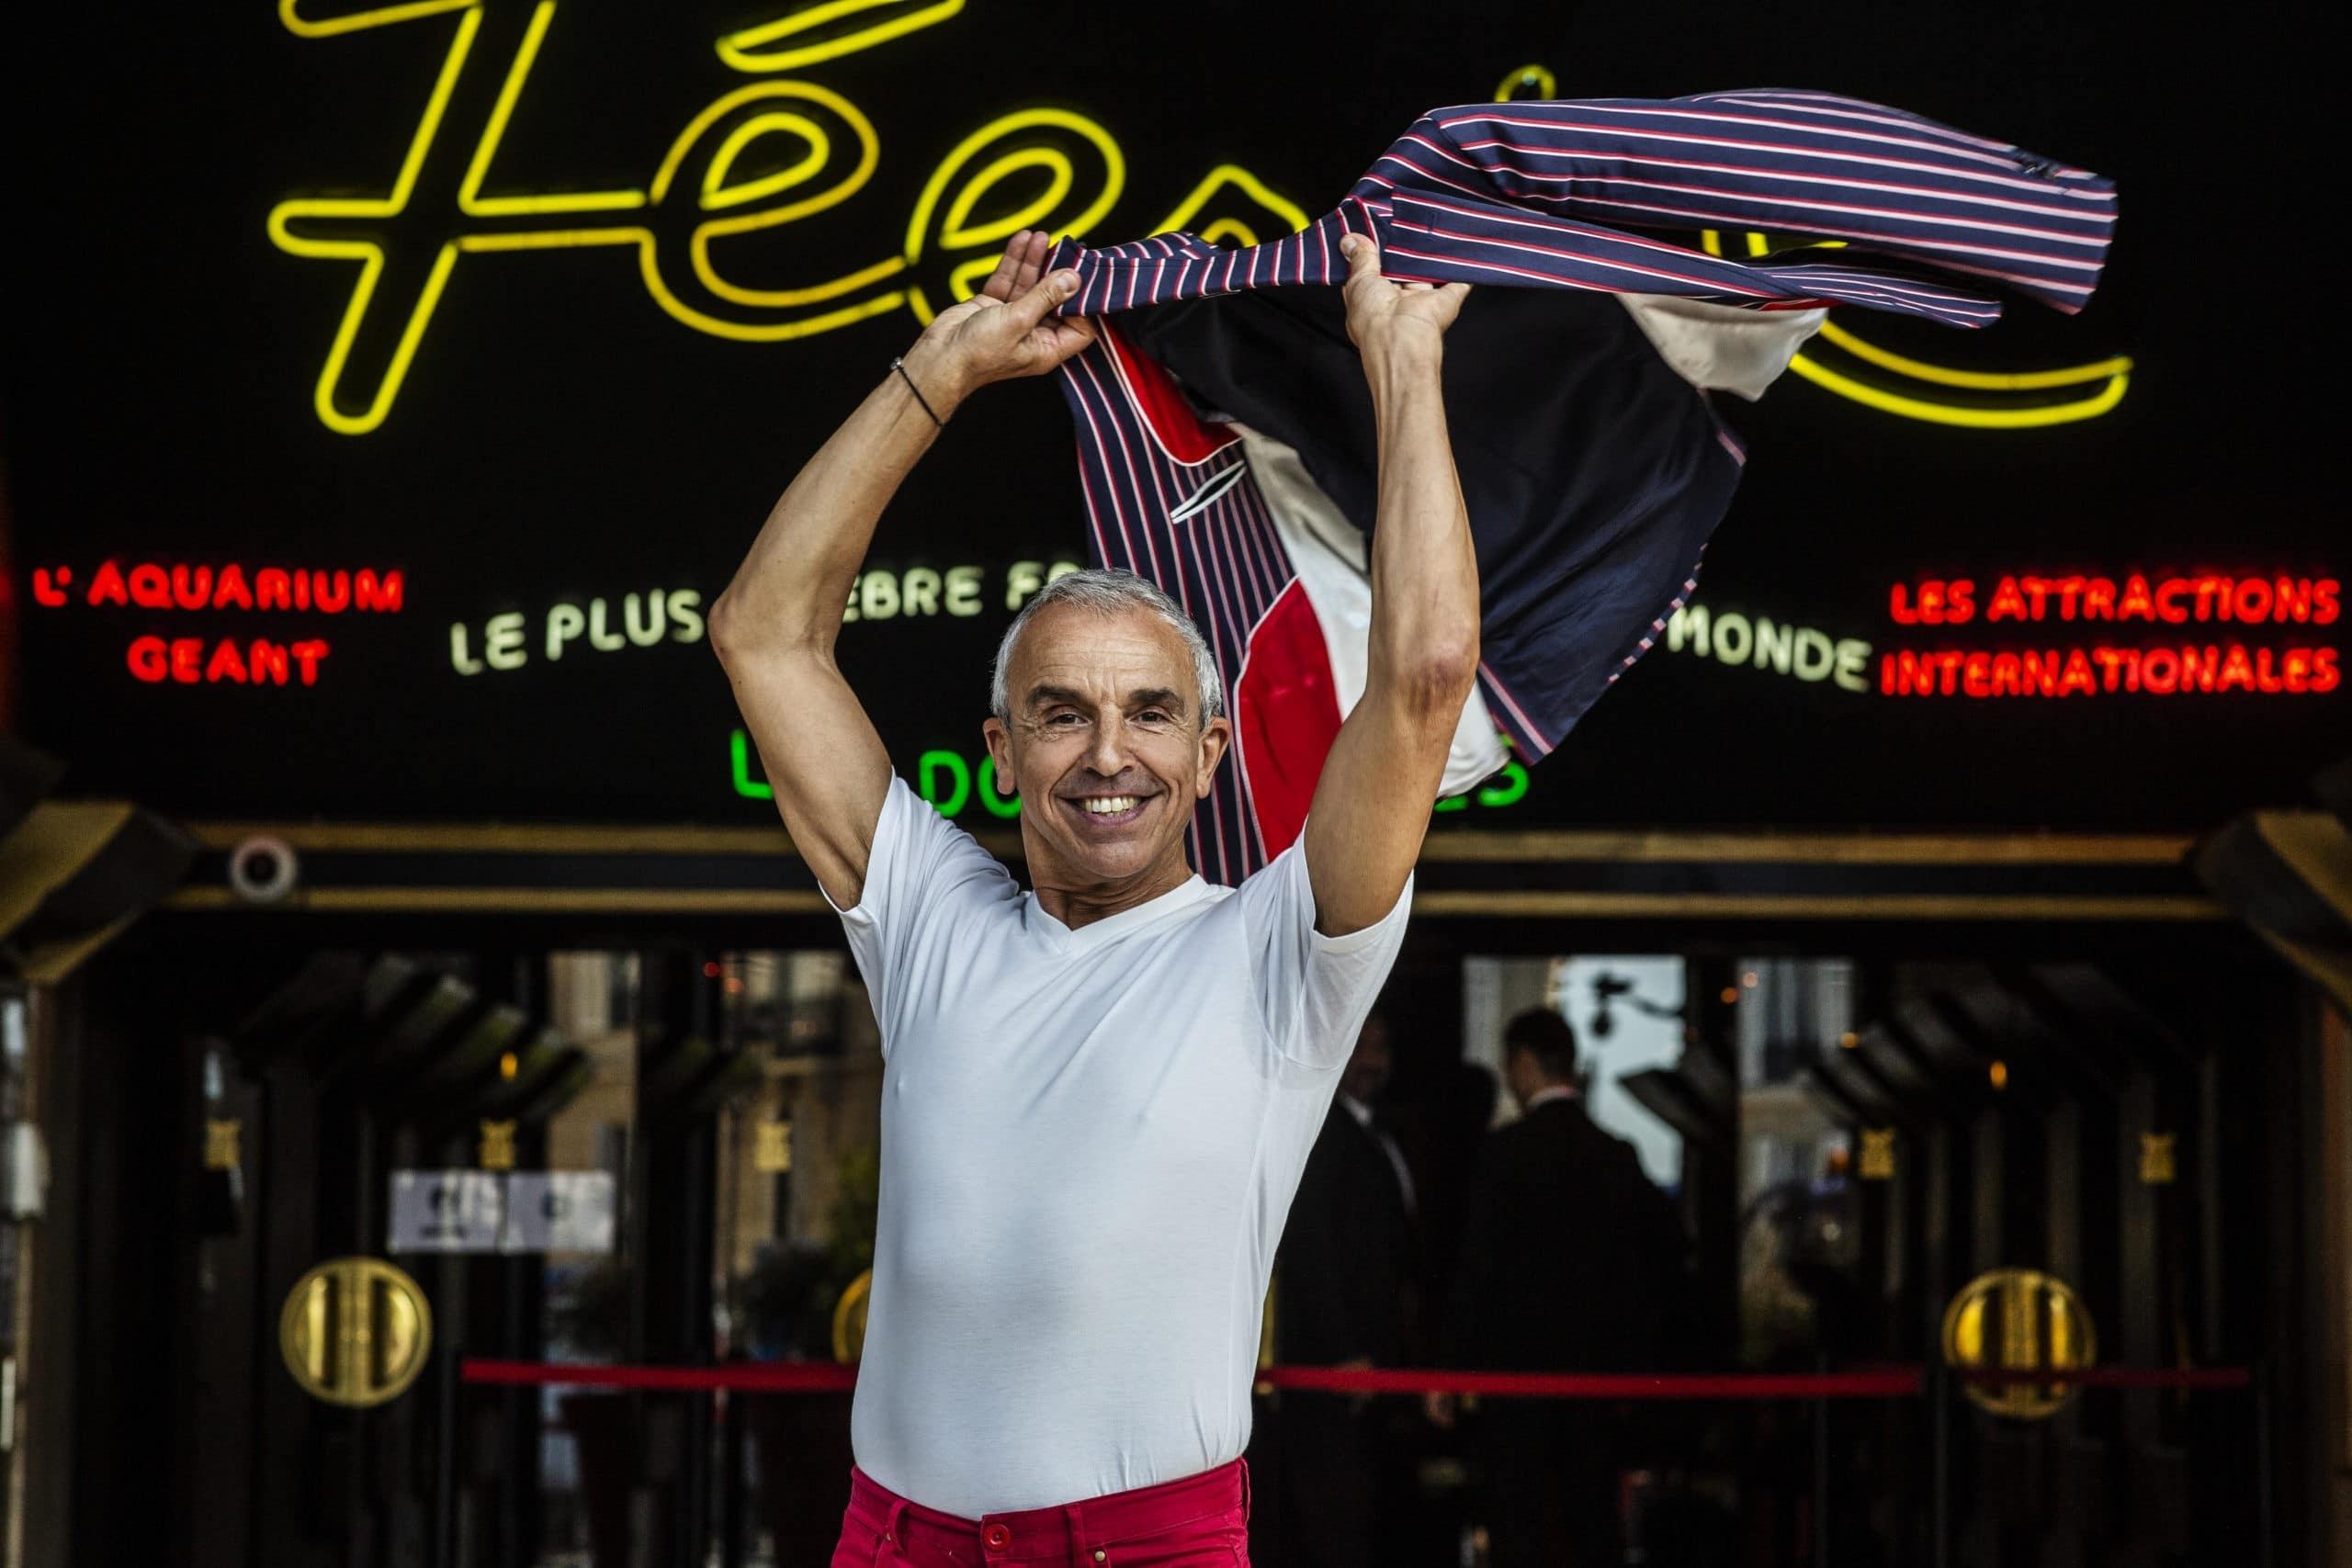 Thierry Outrilla-le Moulin de son Coeur-3-ParisBazaar-Marion